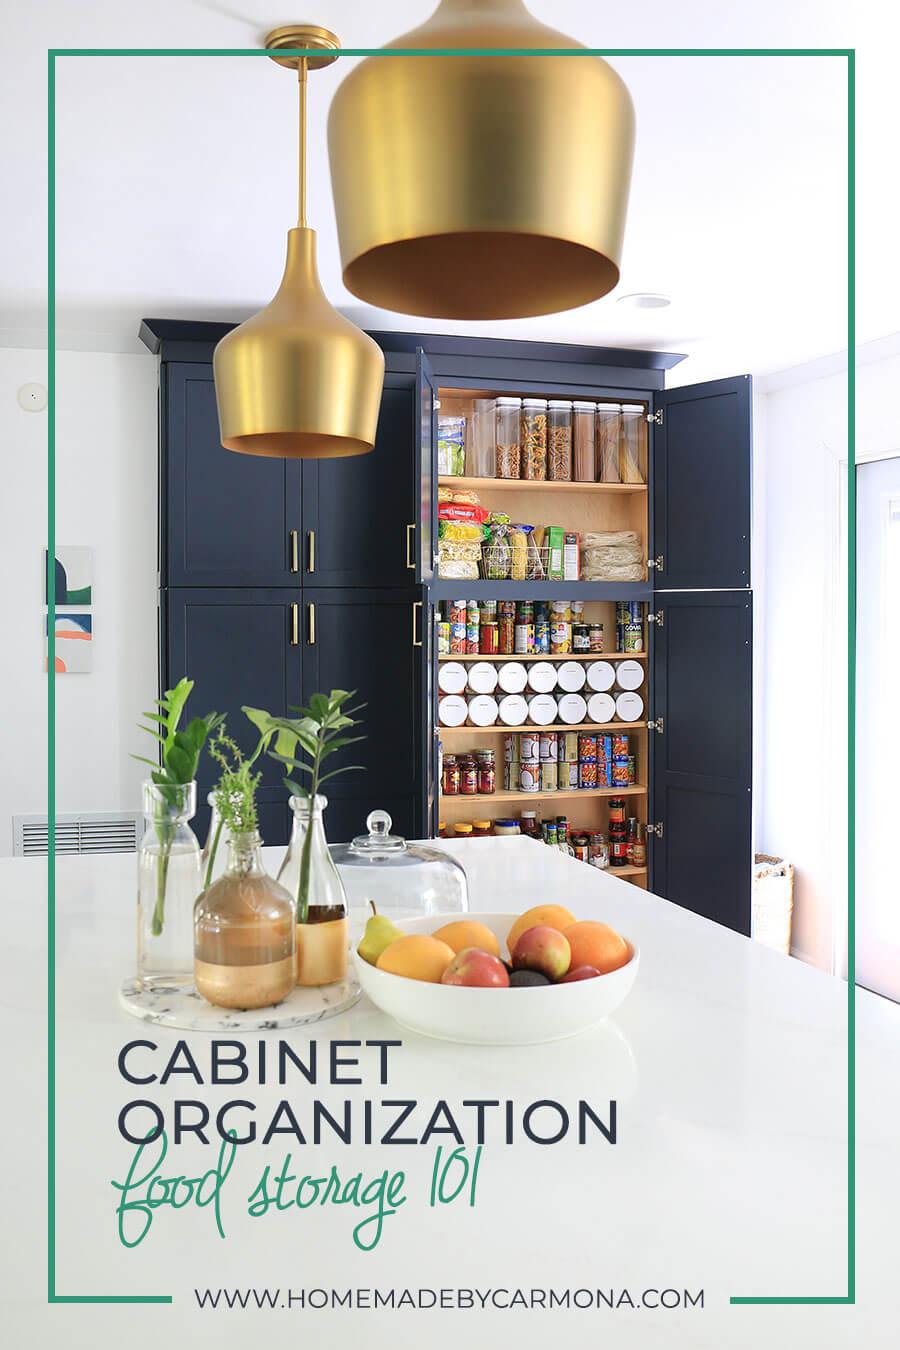 Cabinet Organization - Food Storage 101